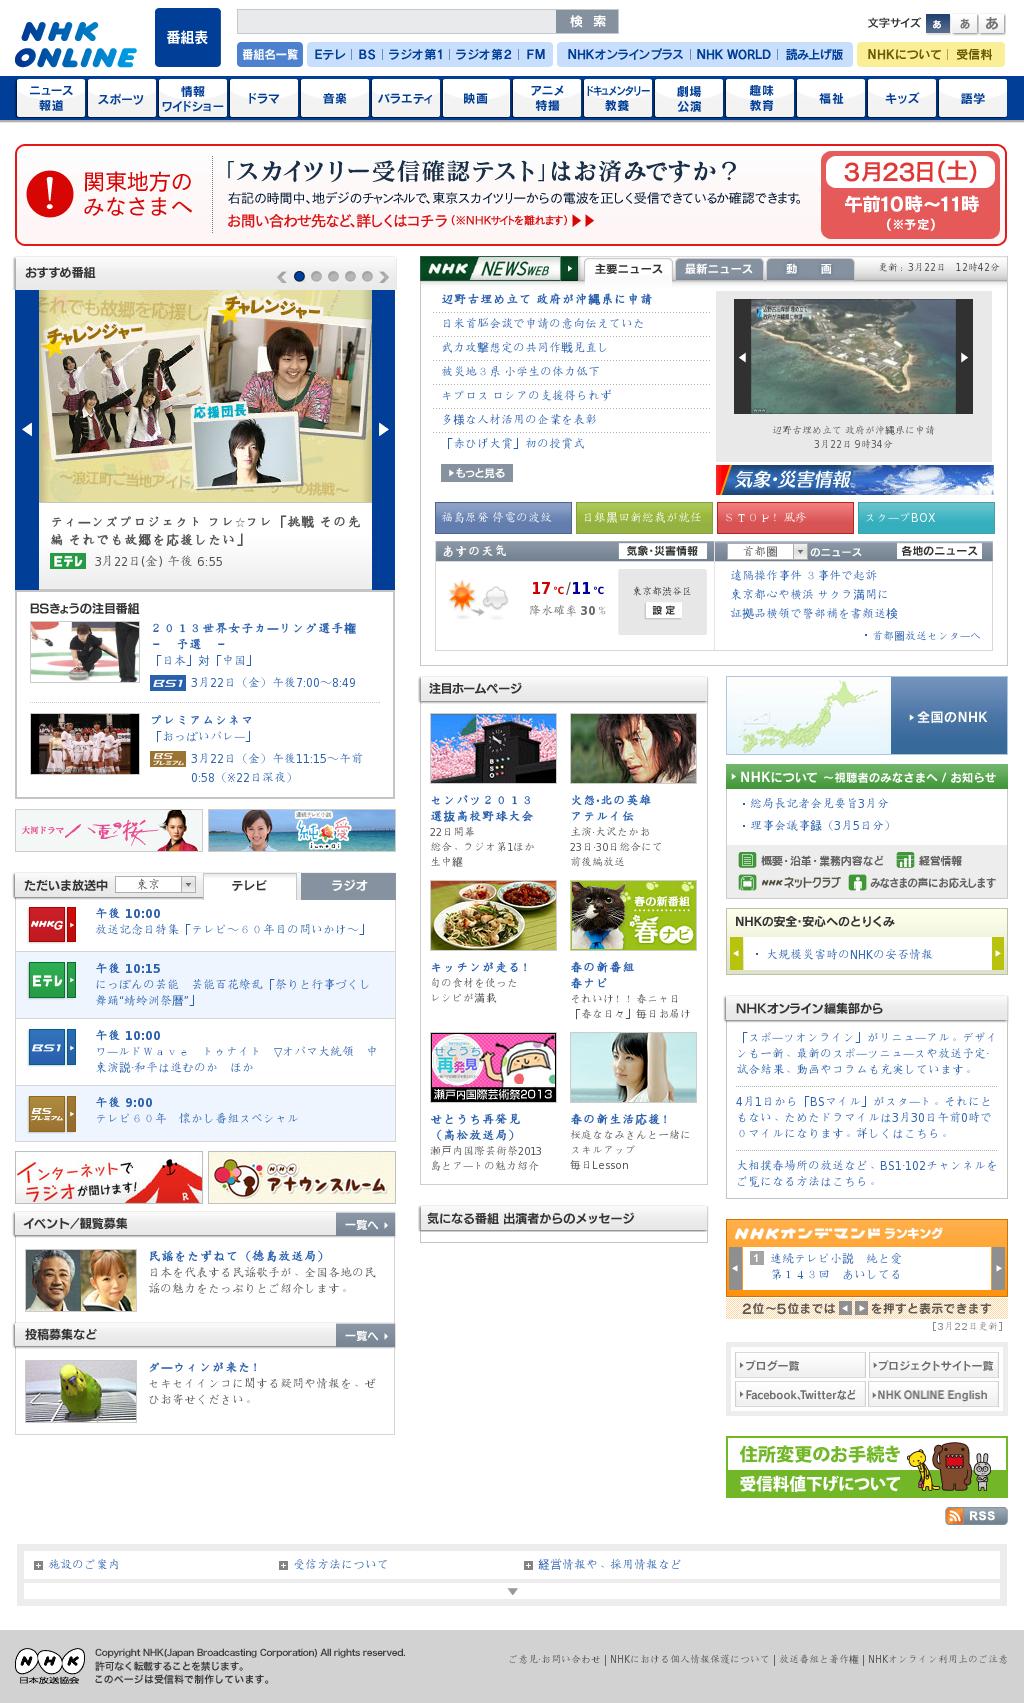 NHK Online at Friday March 22, 2013, 1:18 p.m. UTC